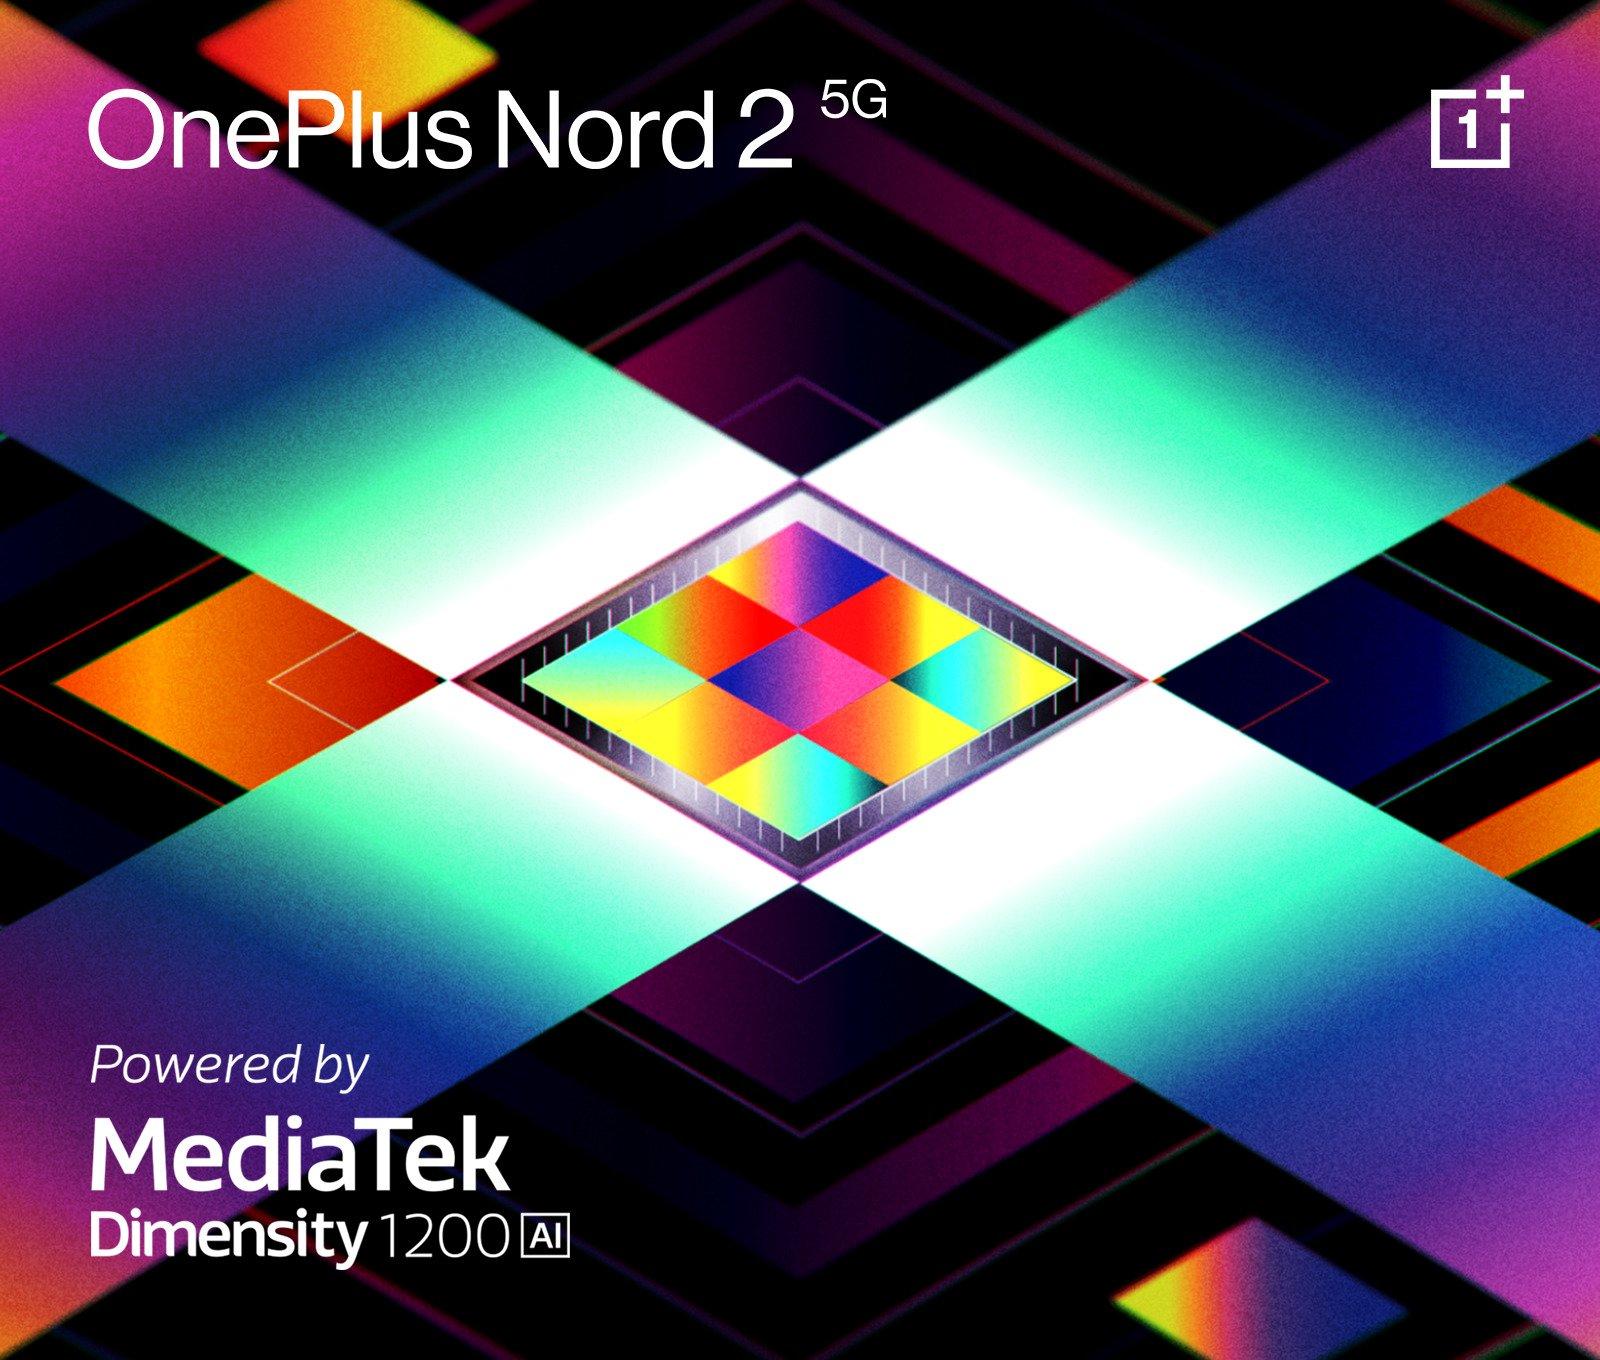 oneplus-nord-2-processeur-puce-mediatek